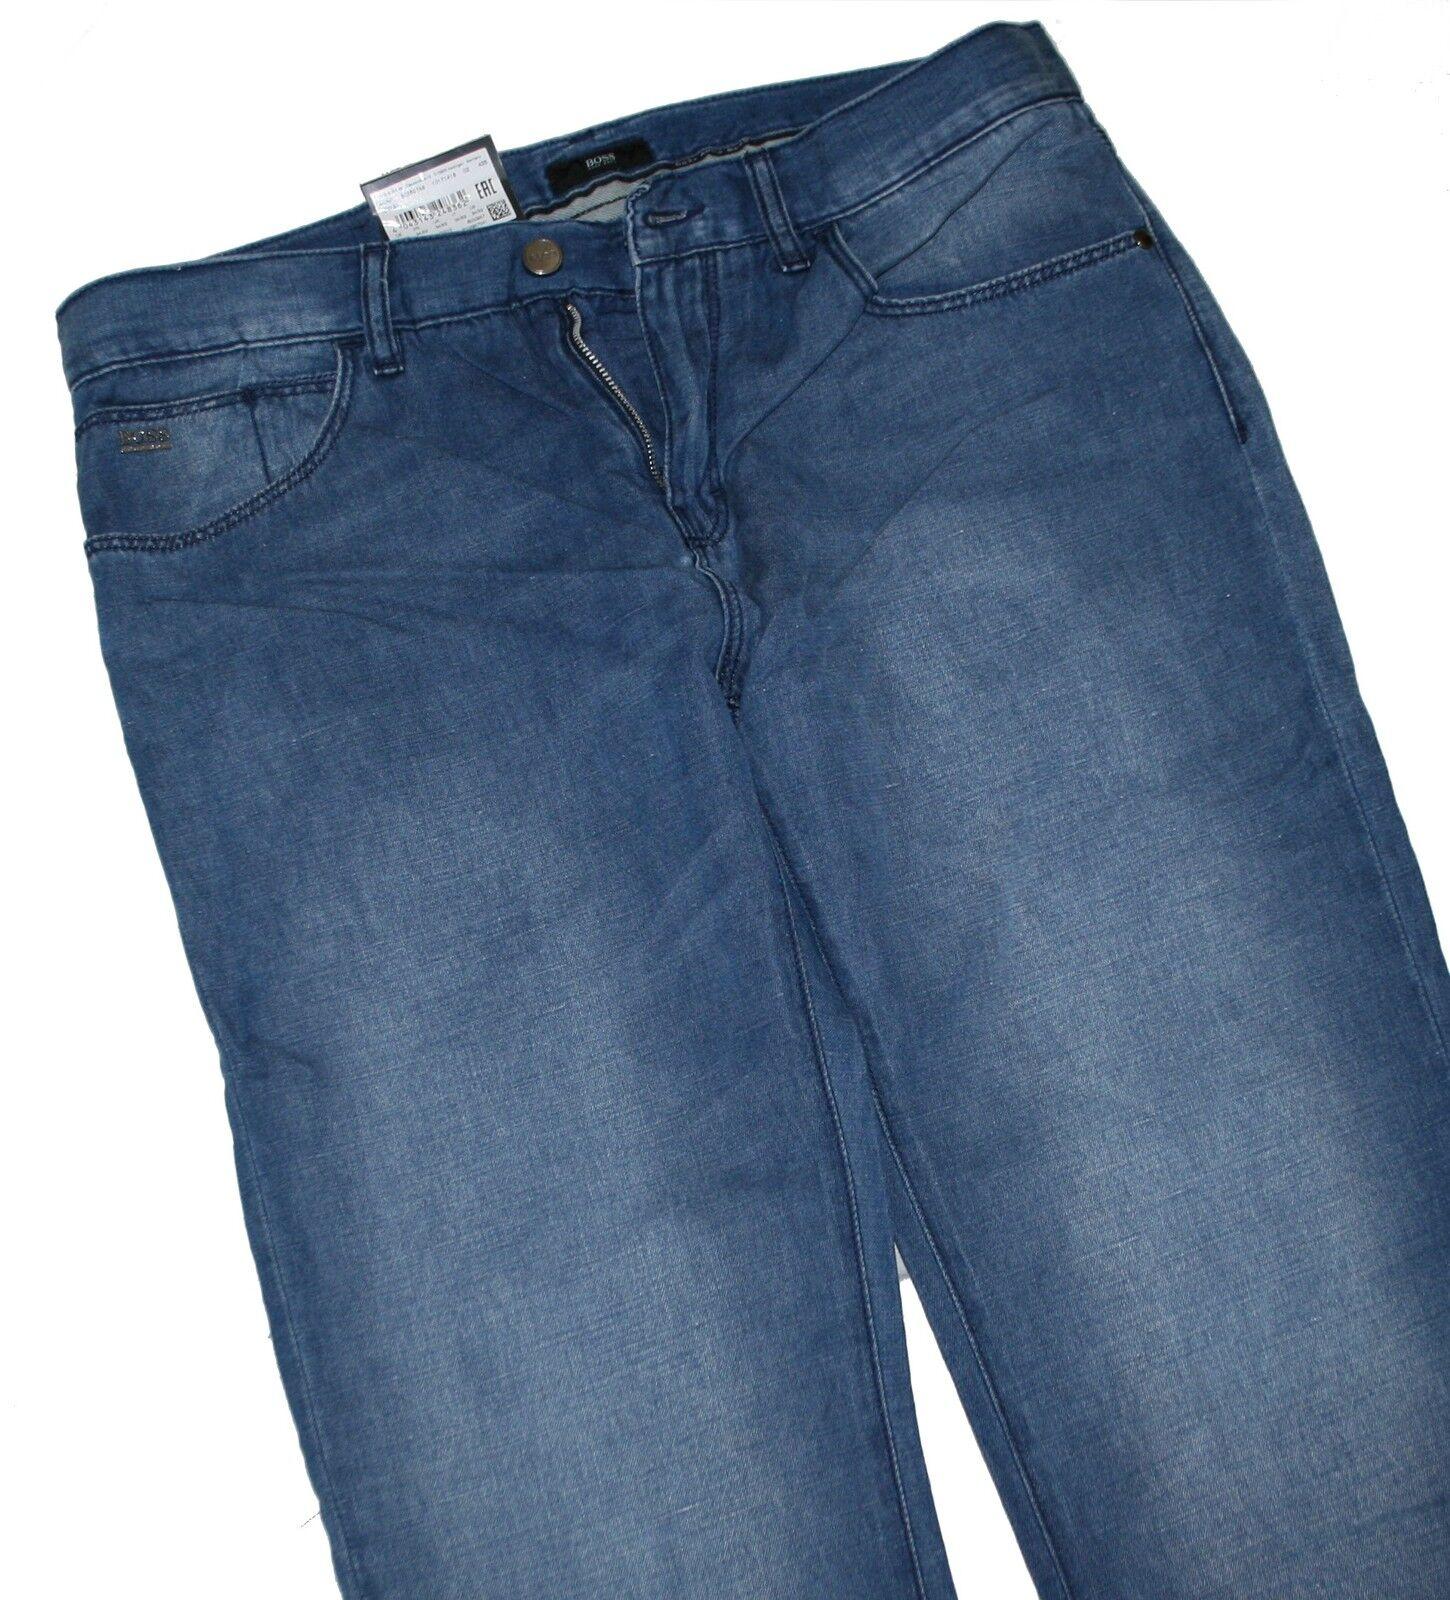 Hugo Boss 50260748 Medium bluee Cotton   Leinen Iowa Jeans mit 30% Leinen